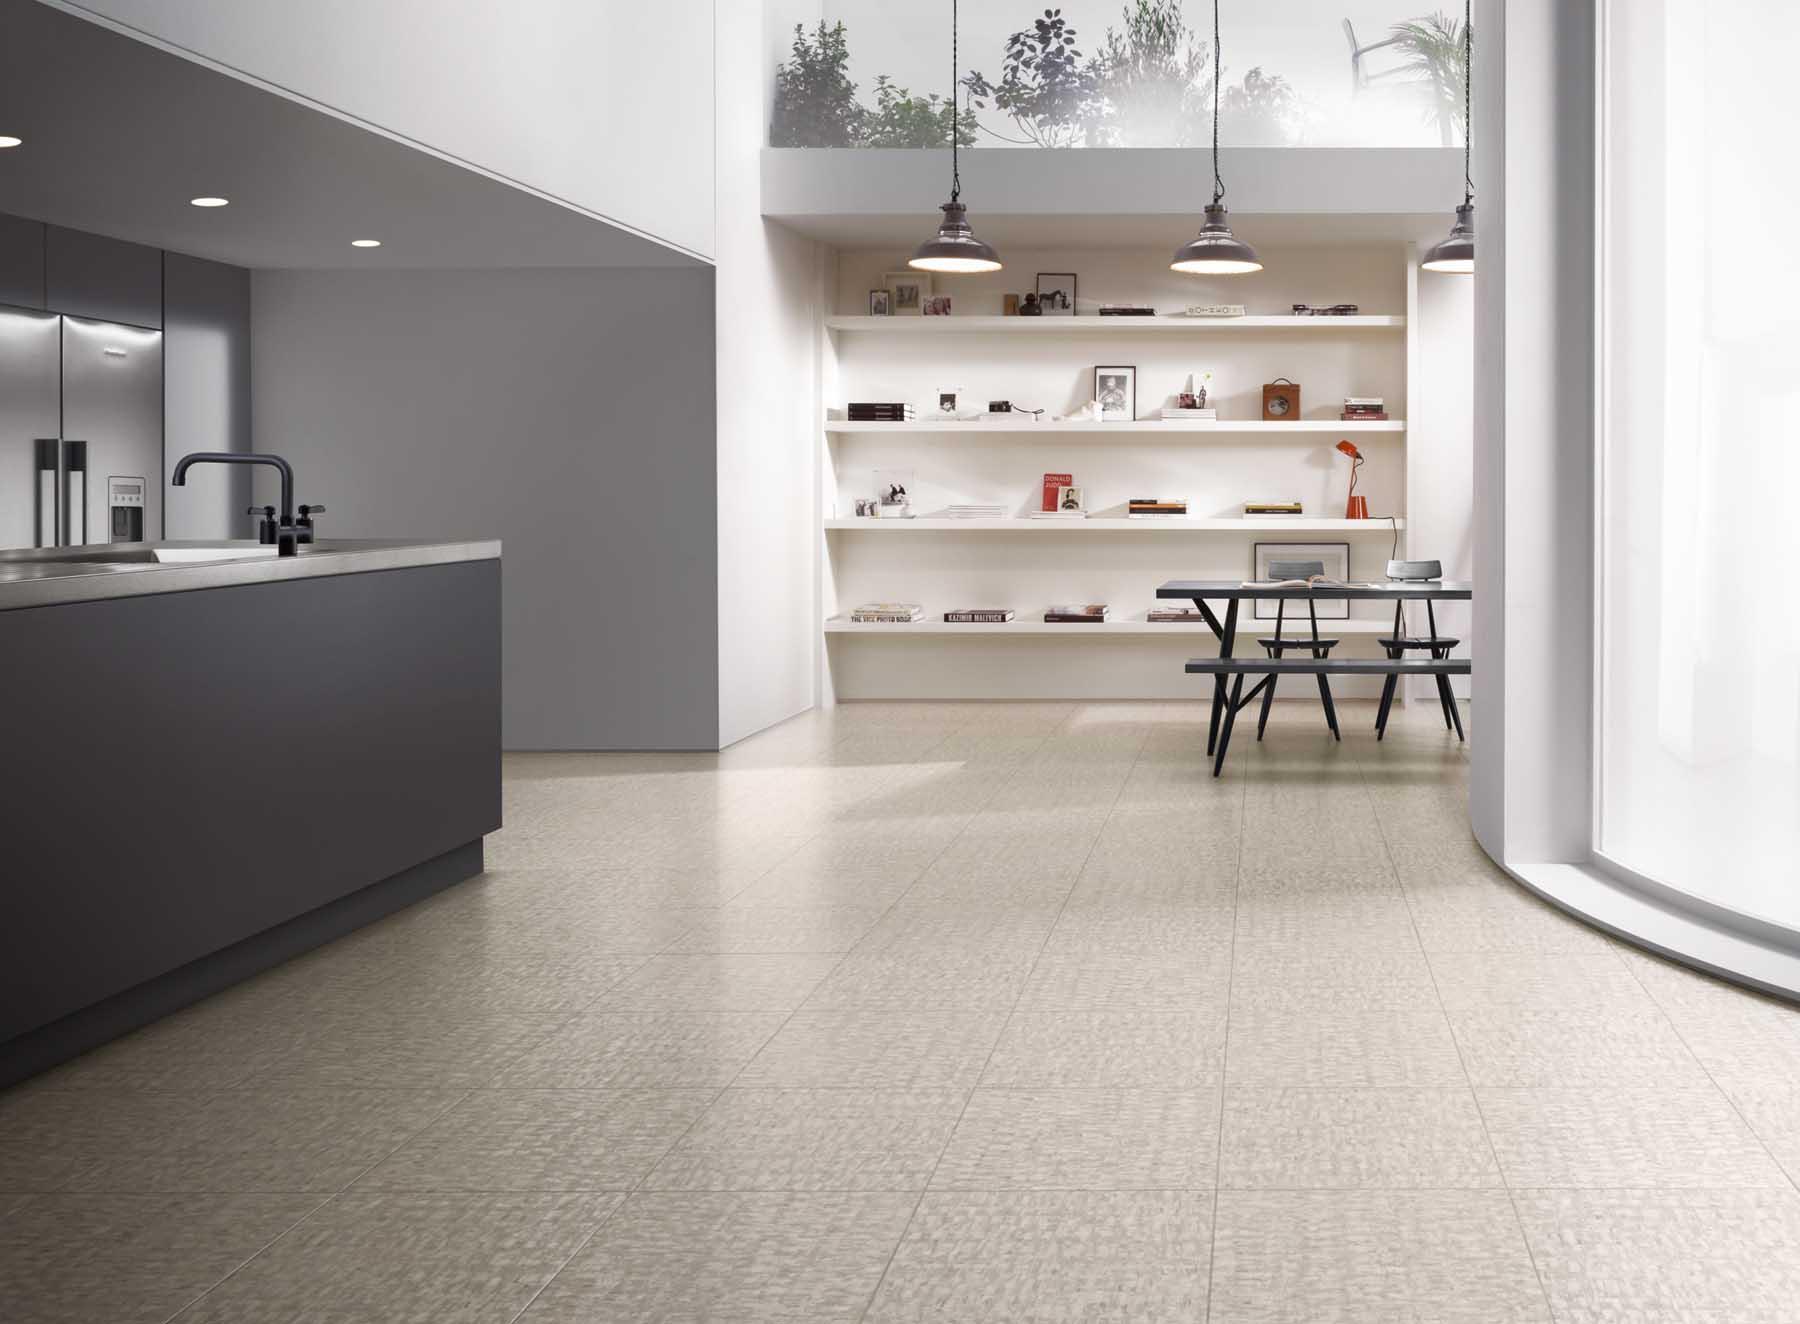 inspireflooring co cheap kitchen flooring